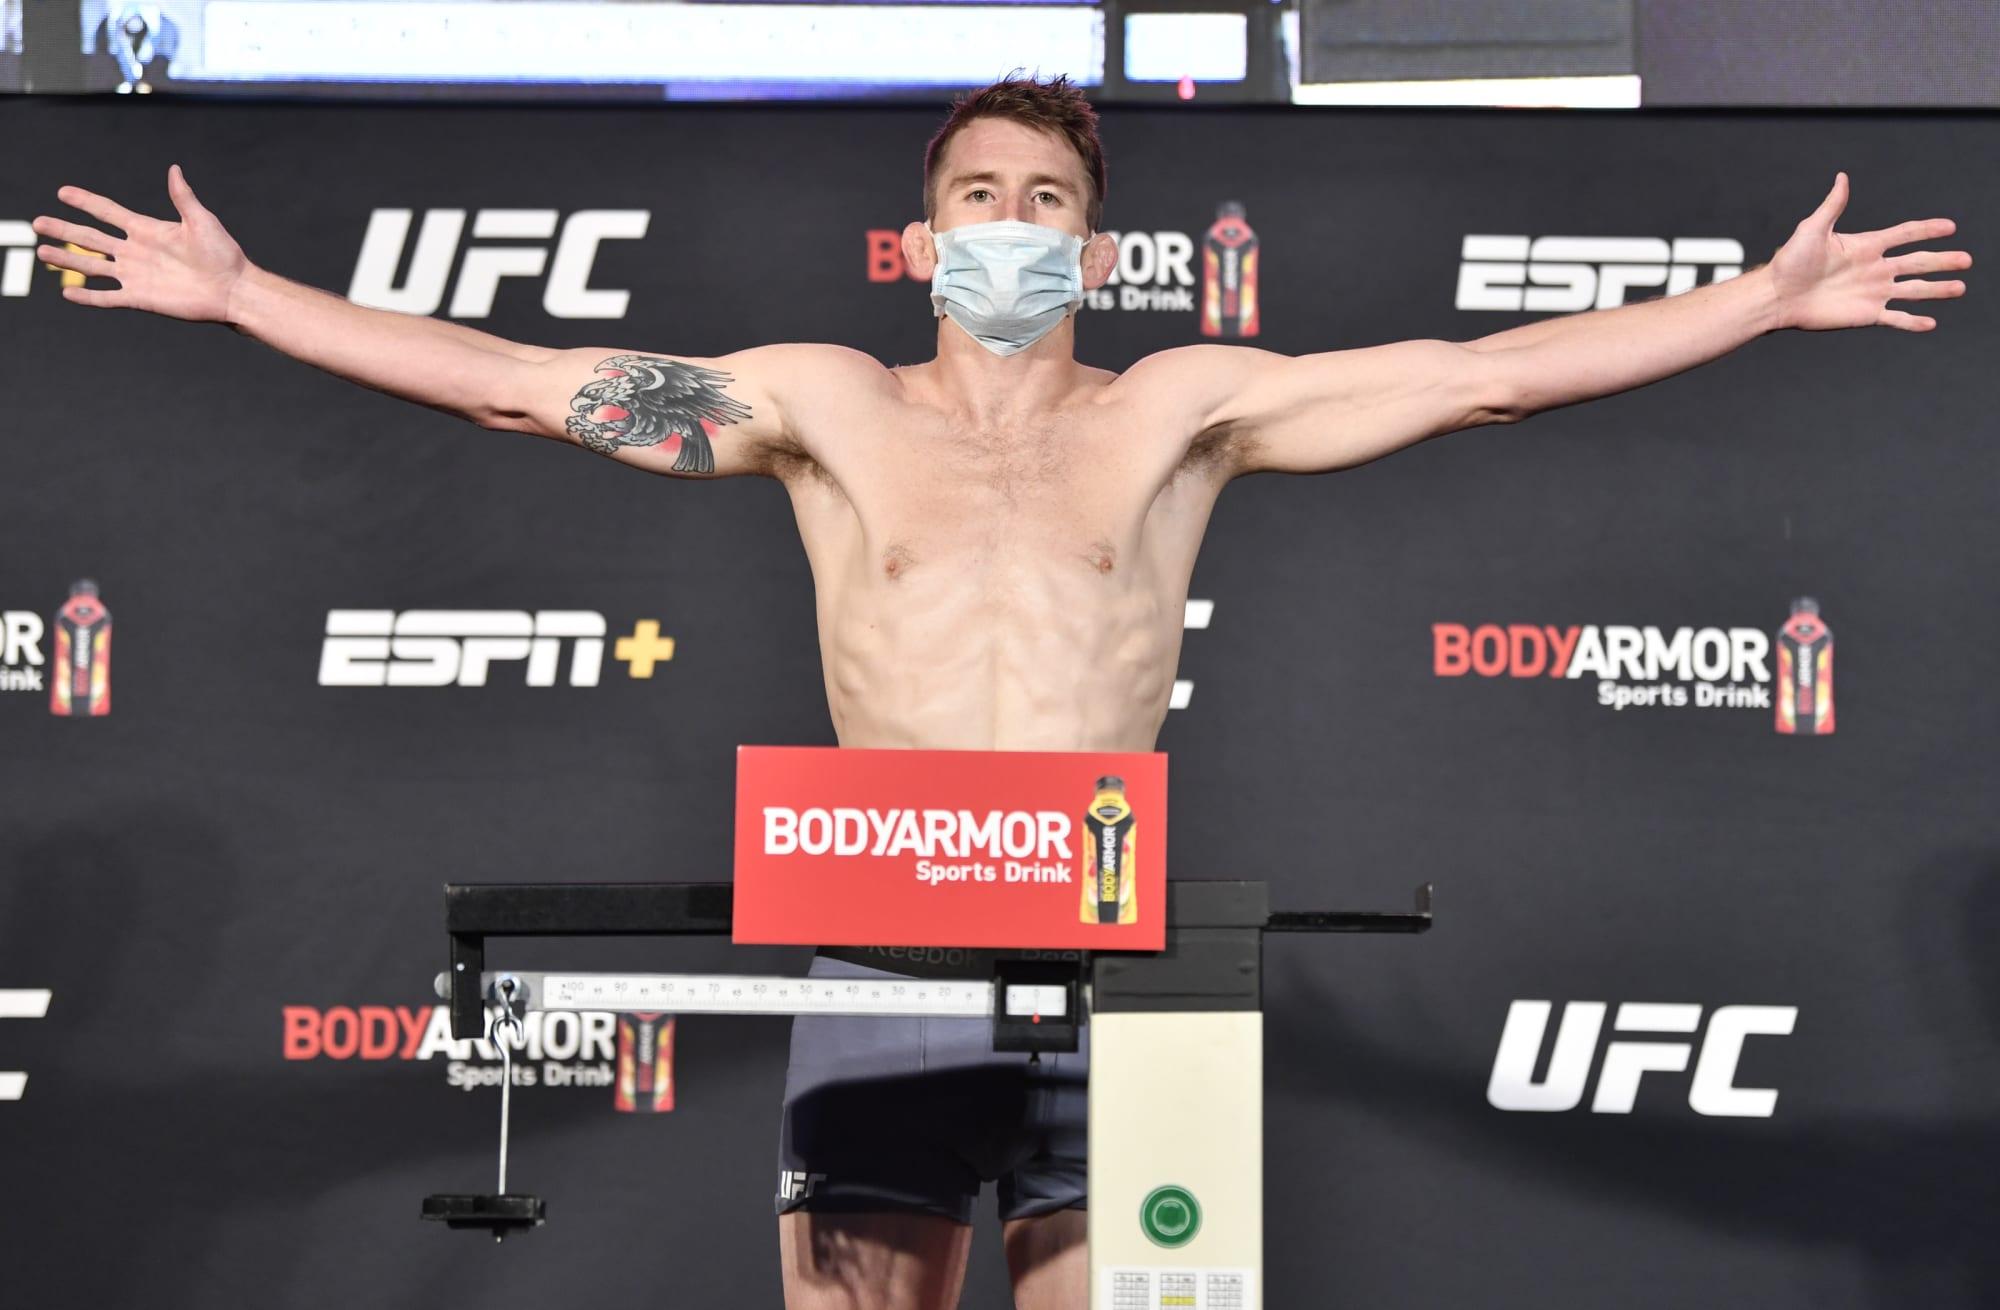 UFC Vegas 32: Cory Sandhagen vs. T.J. Dillashaw weigh-in results